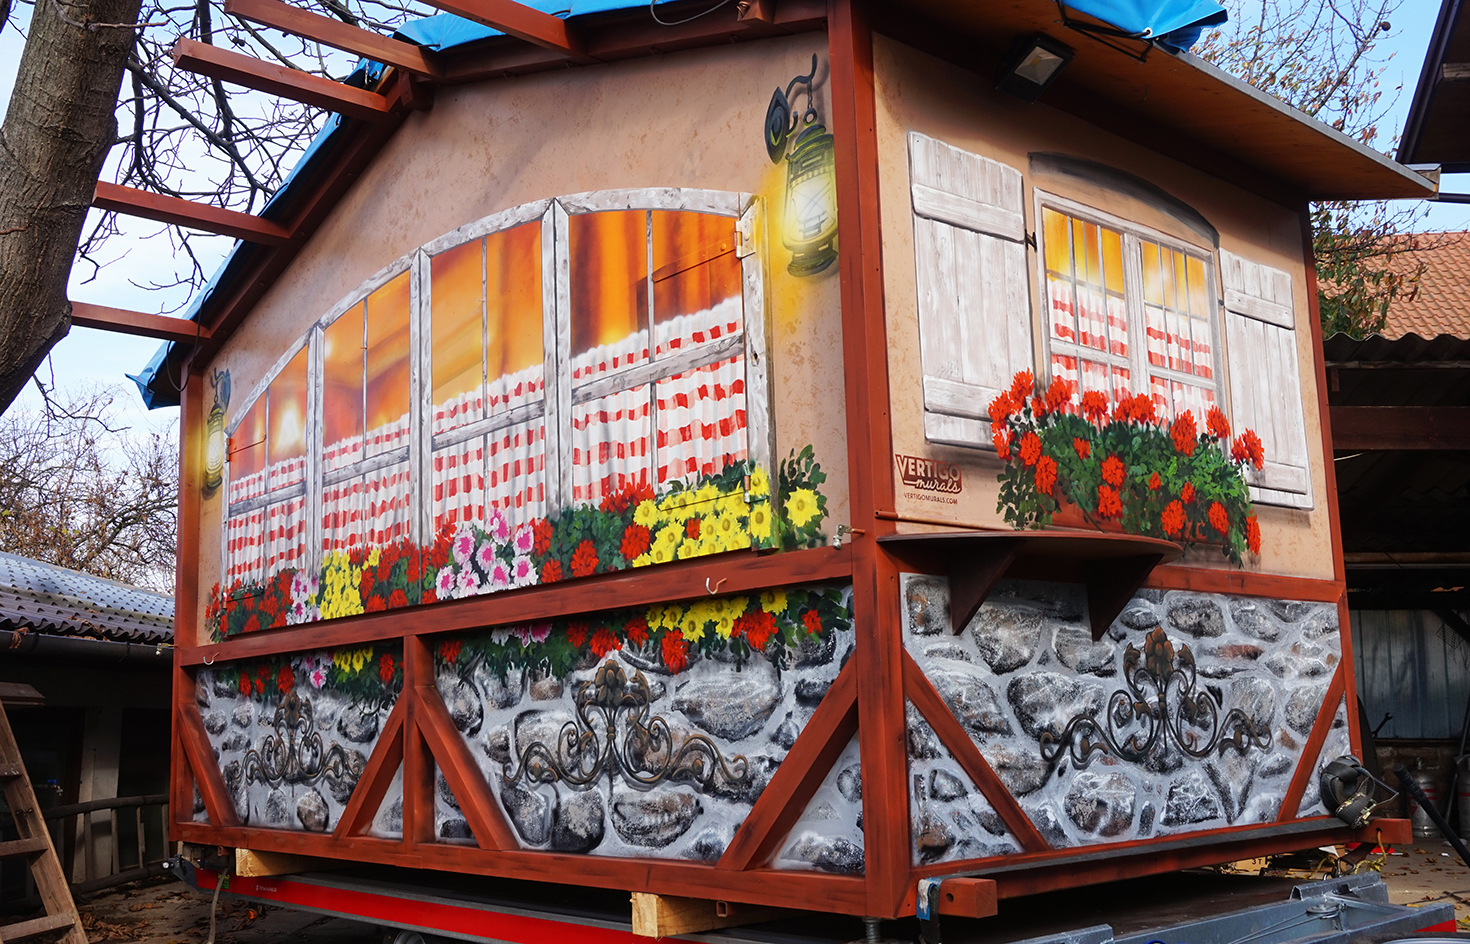 dekorációs falfestés vertigo murals  tűzfalfestés dekorfestés falfestmények.jpg